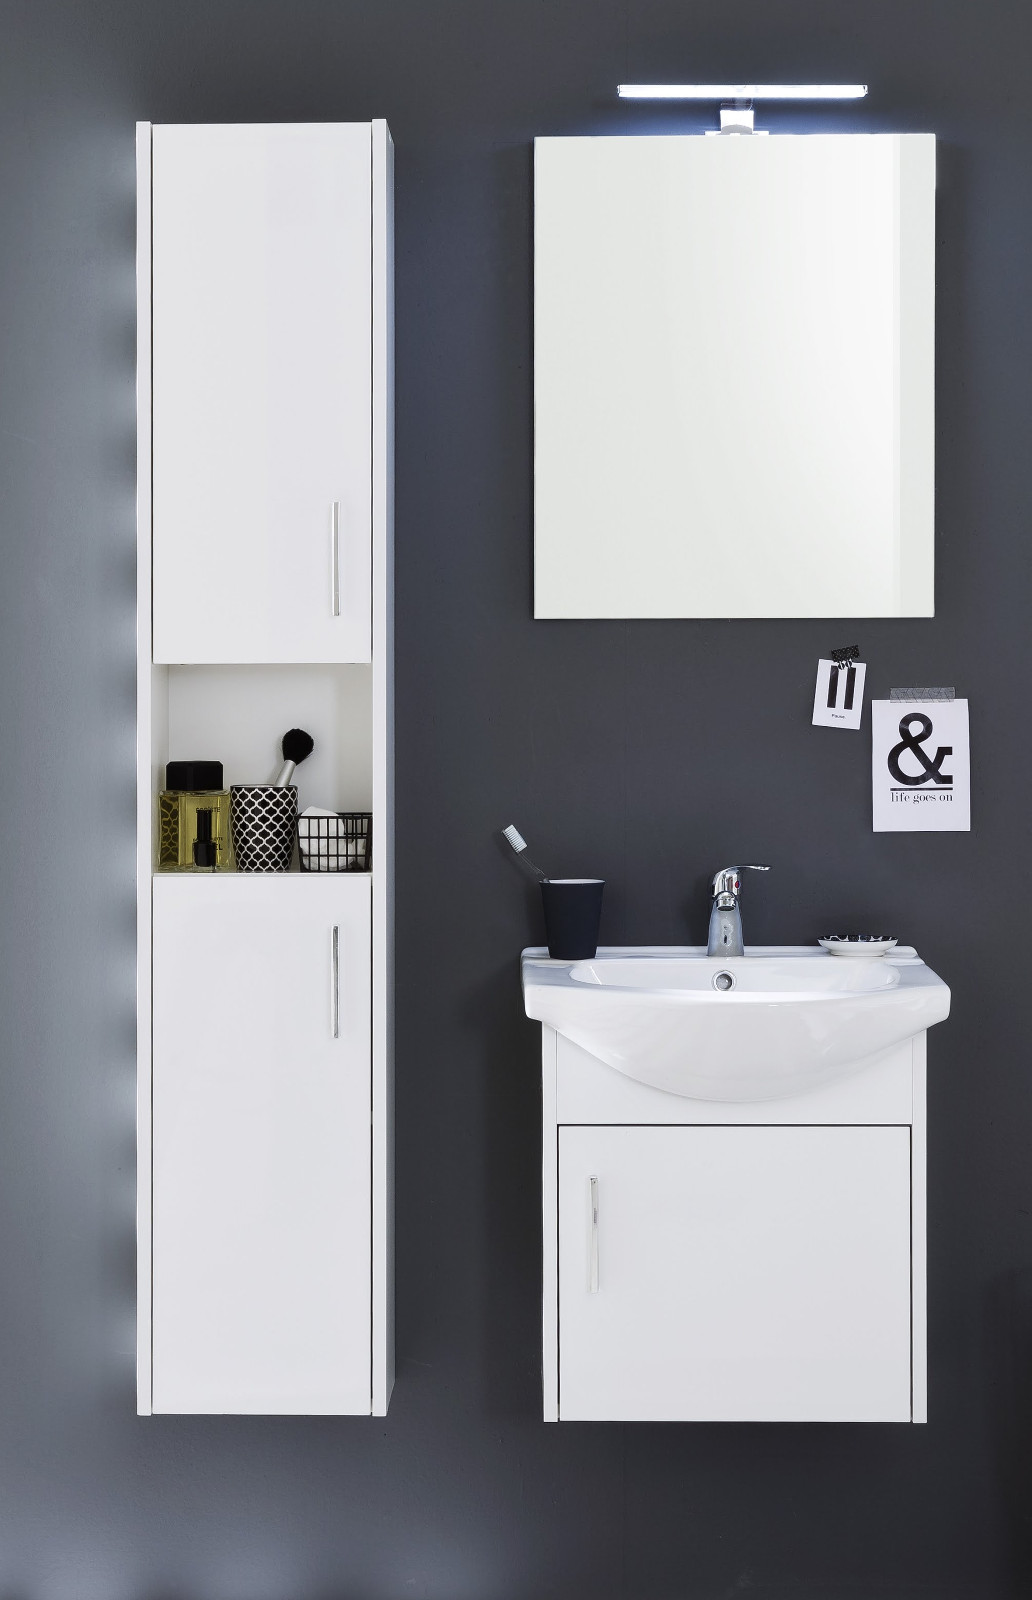 badspiegel jersey in wei optional led ansatzleuchte. Black Bedroom Furniture Sets. Home Design Ideas